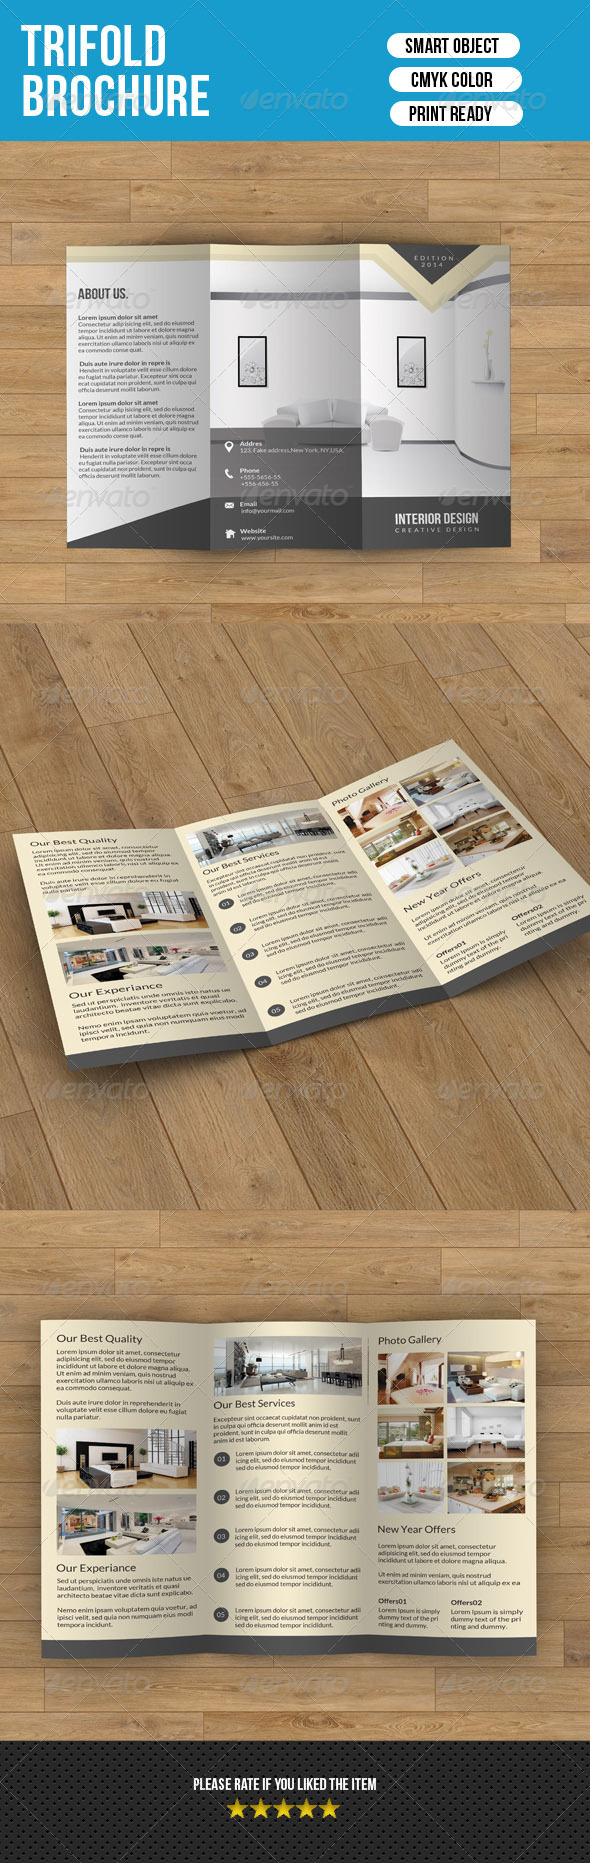 Minimal Trifold-Interior Design V2 - Corporate Brochures